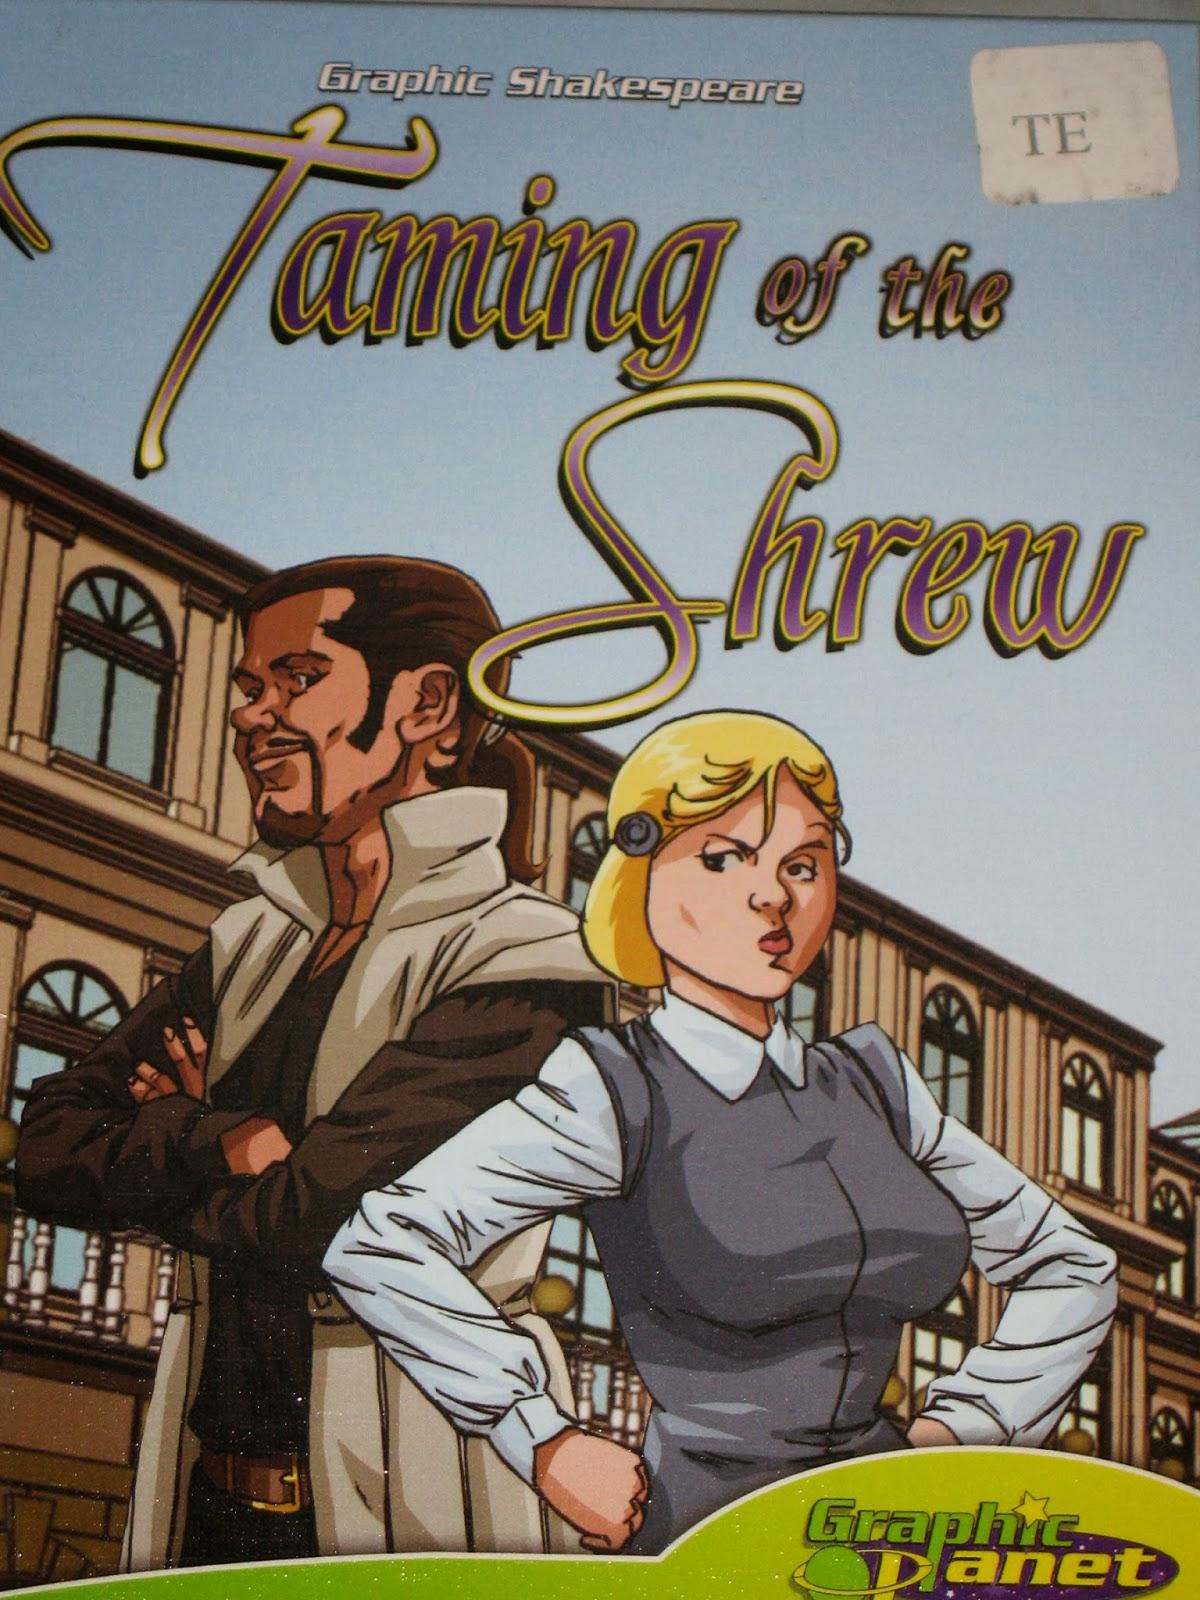 shakespeare taming of the shrew essays 91 121 113 106 shakespeare taming of the shrew essays